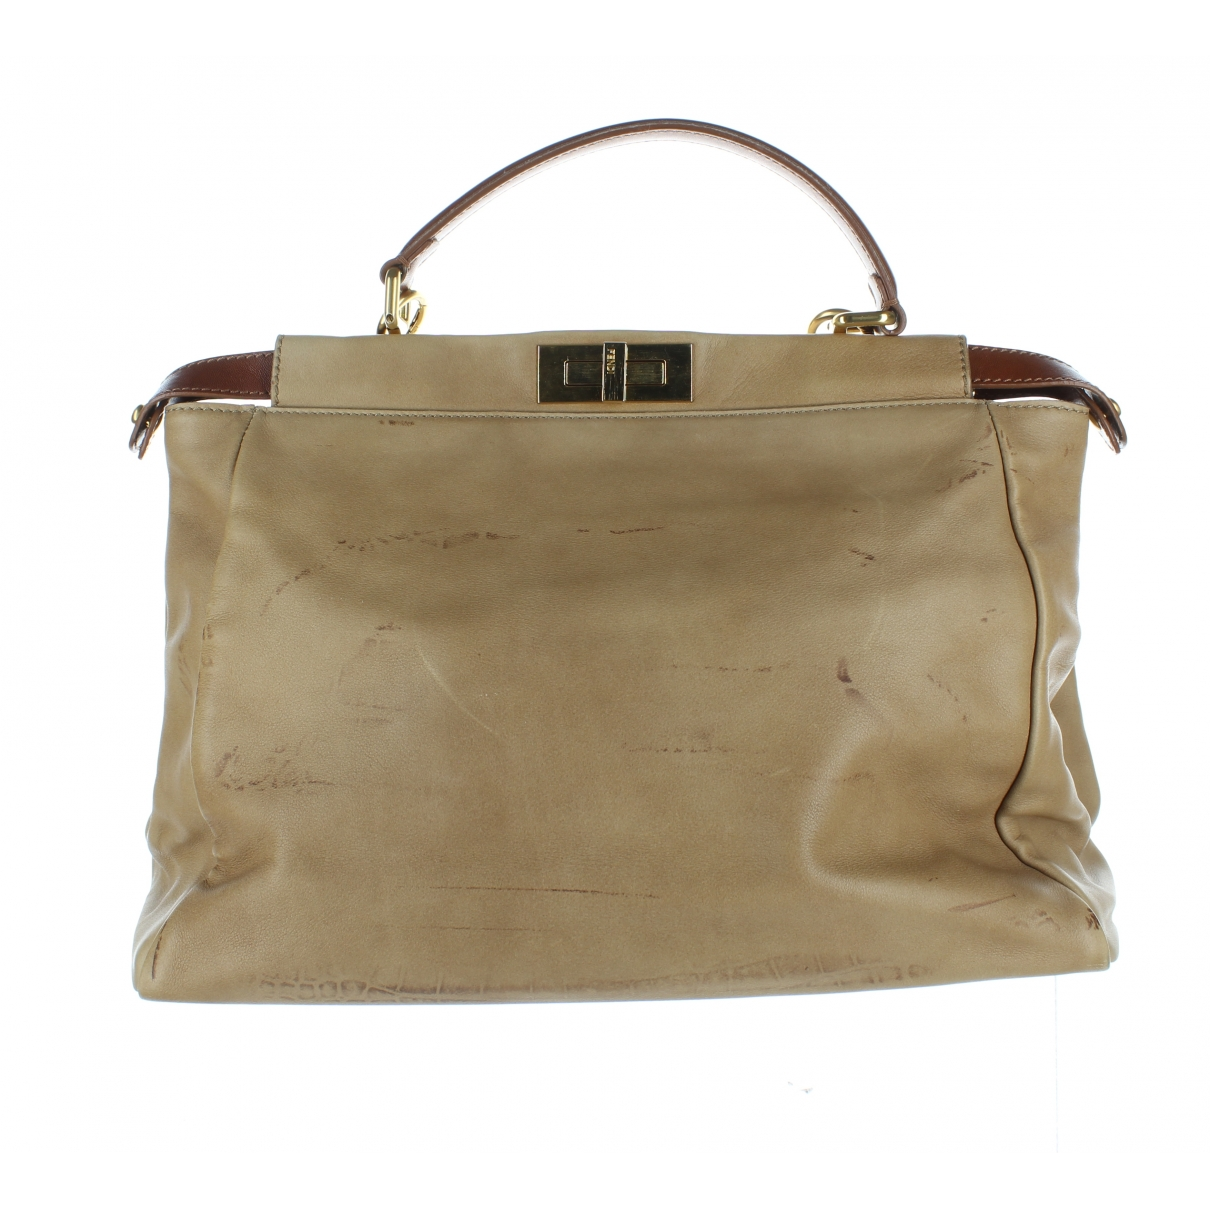 Fendi Peekaboo Beige Leather handbag for Women \N